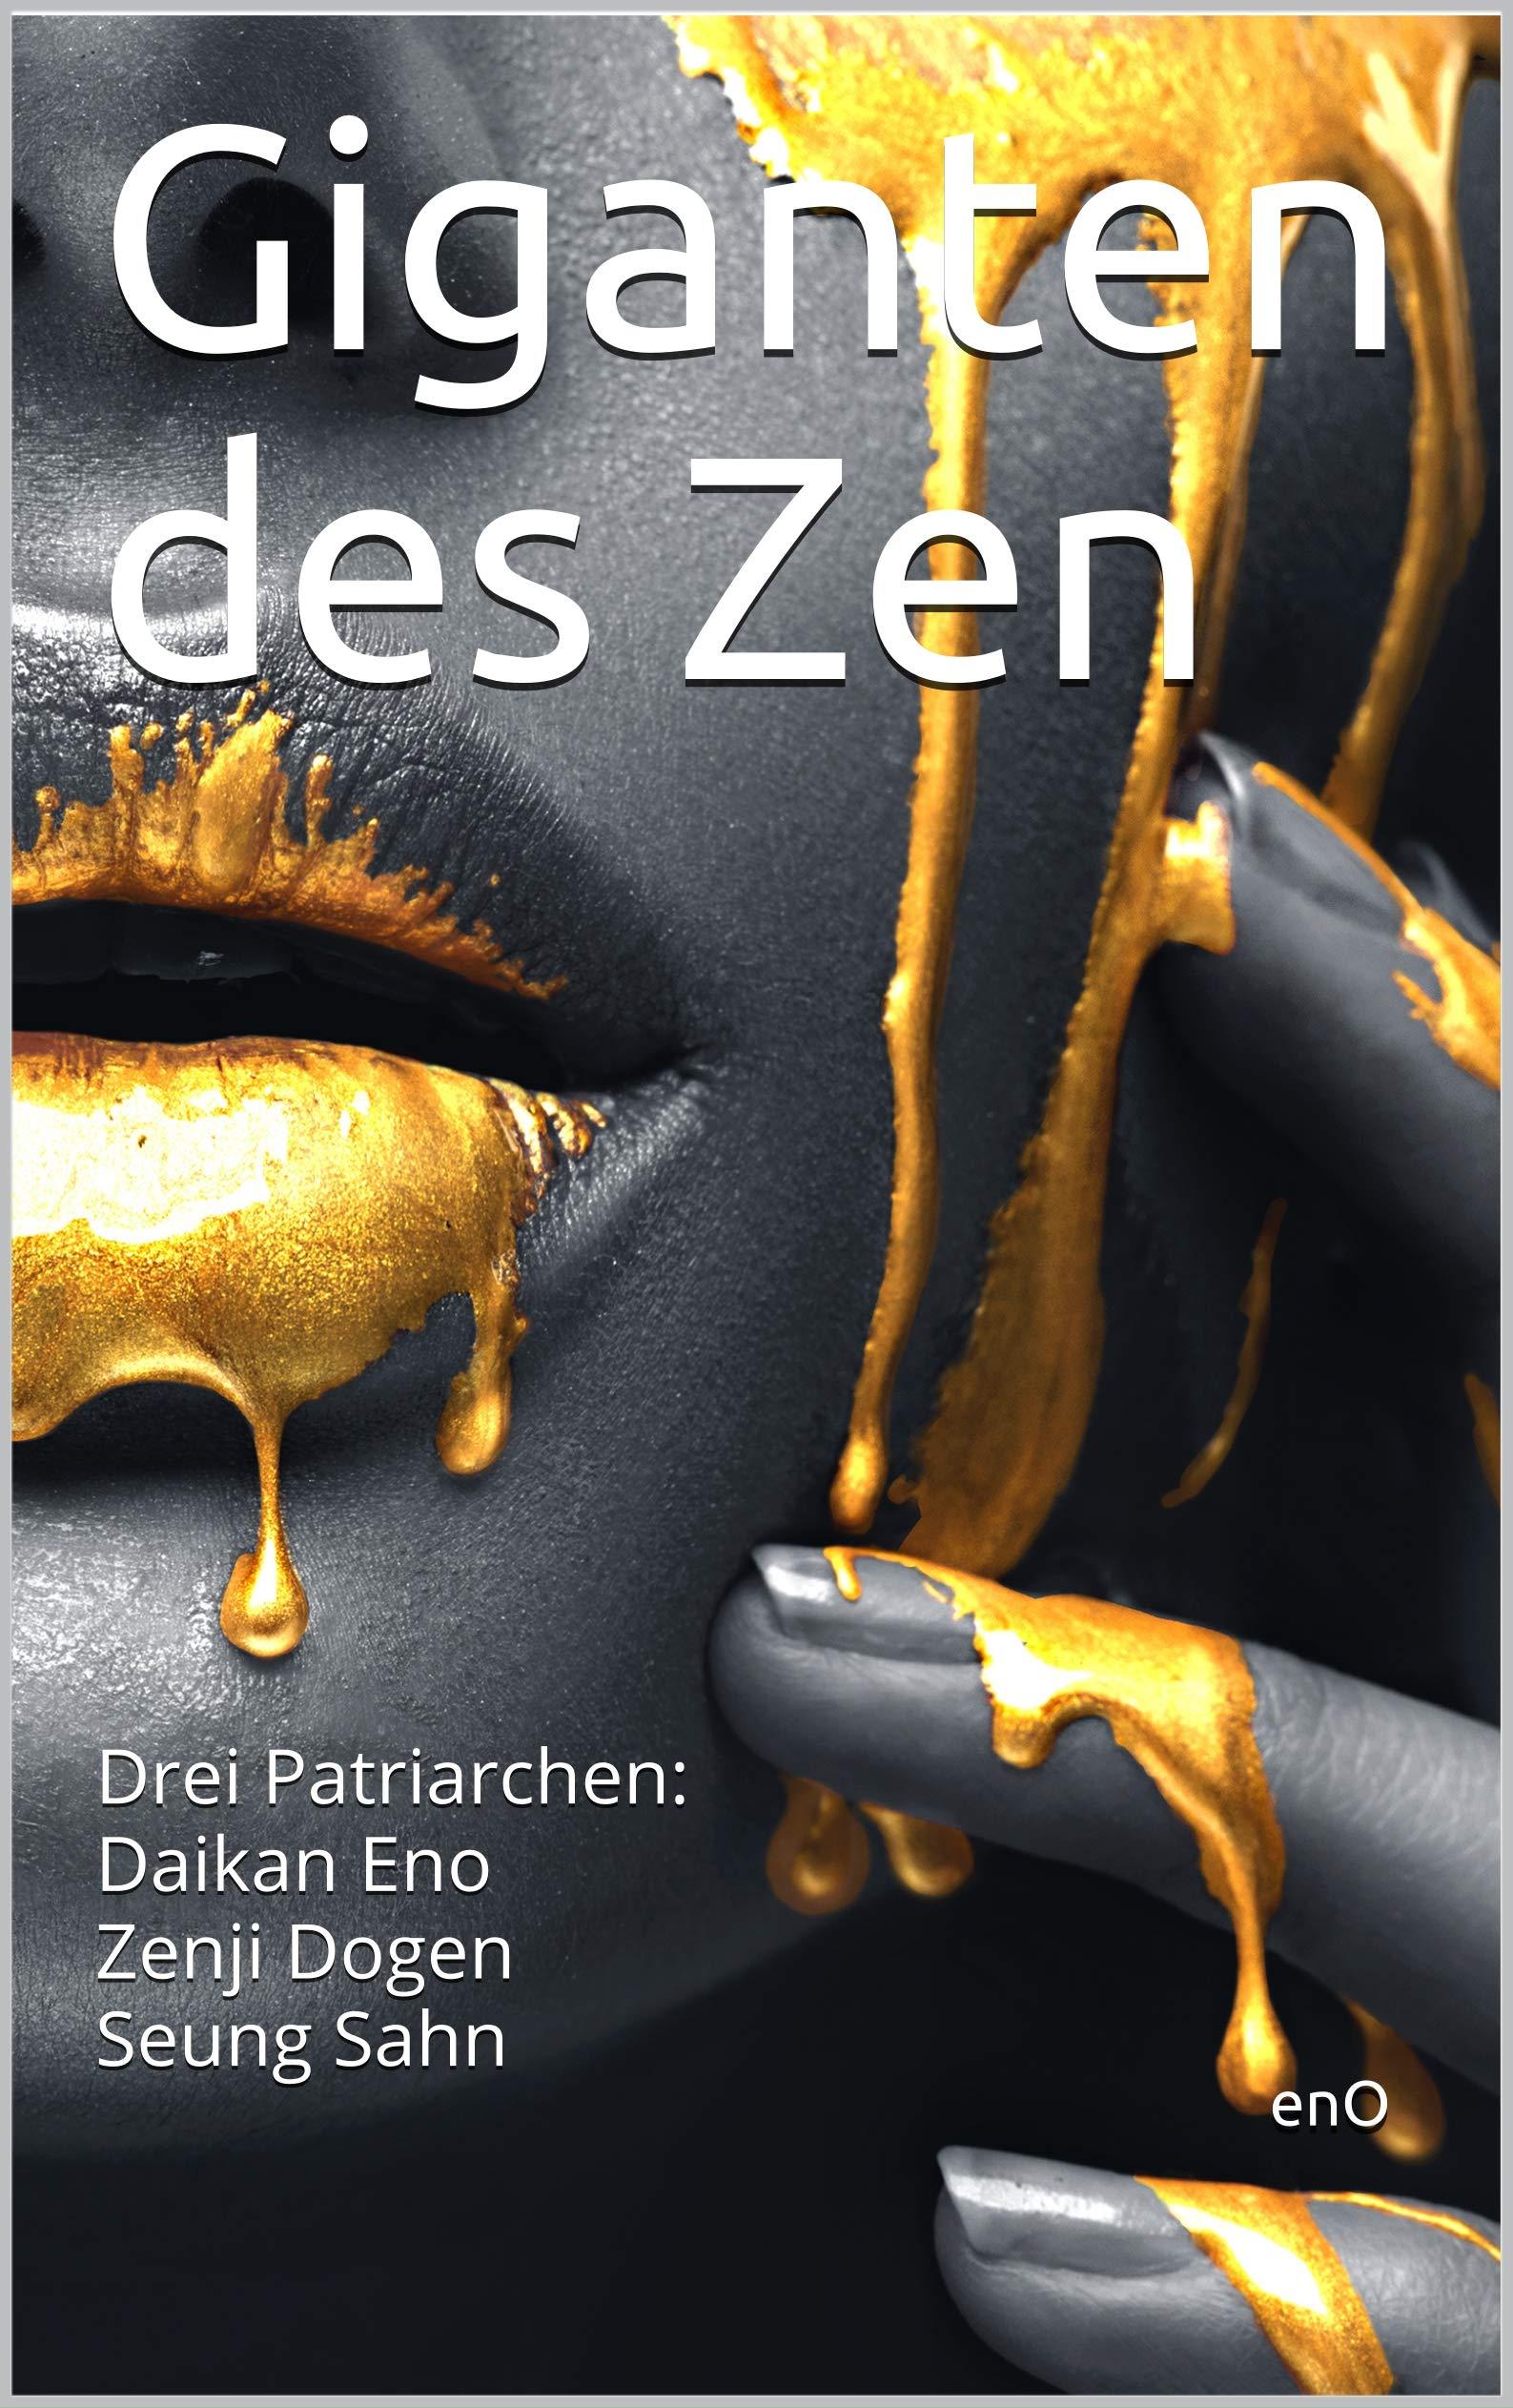 Giganten des Zen: Drei Patriarchen: Daikan Eno, Zenji Dogen, Seung Sahn